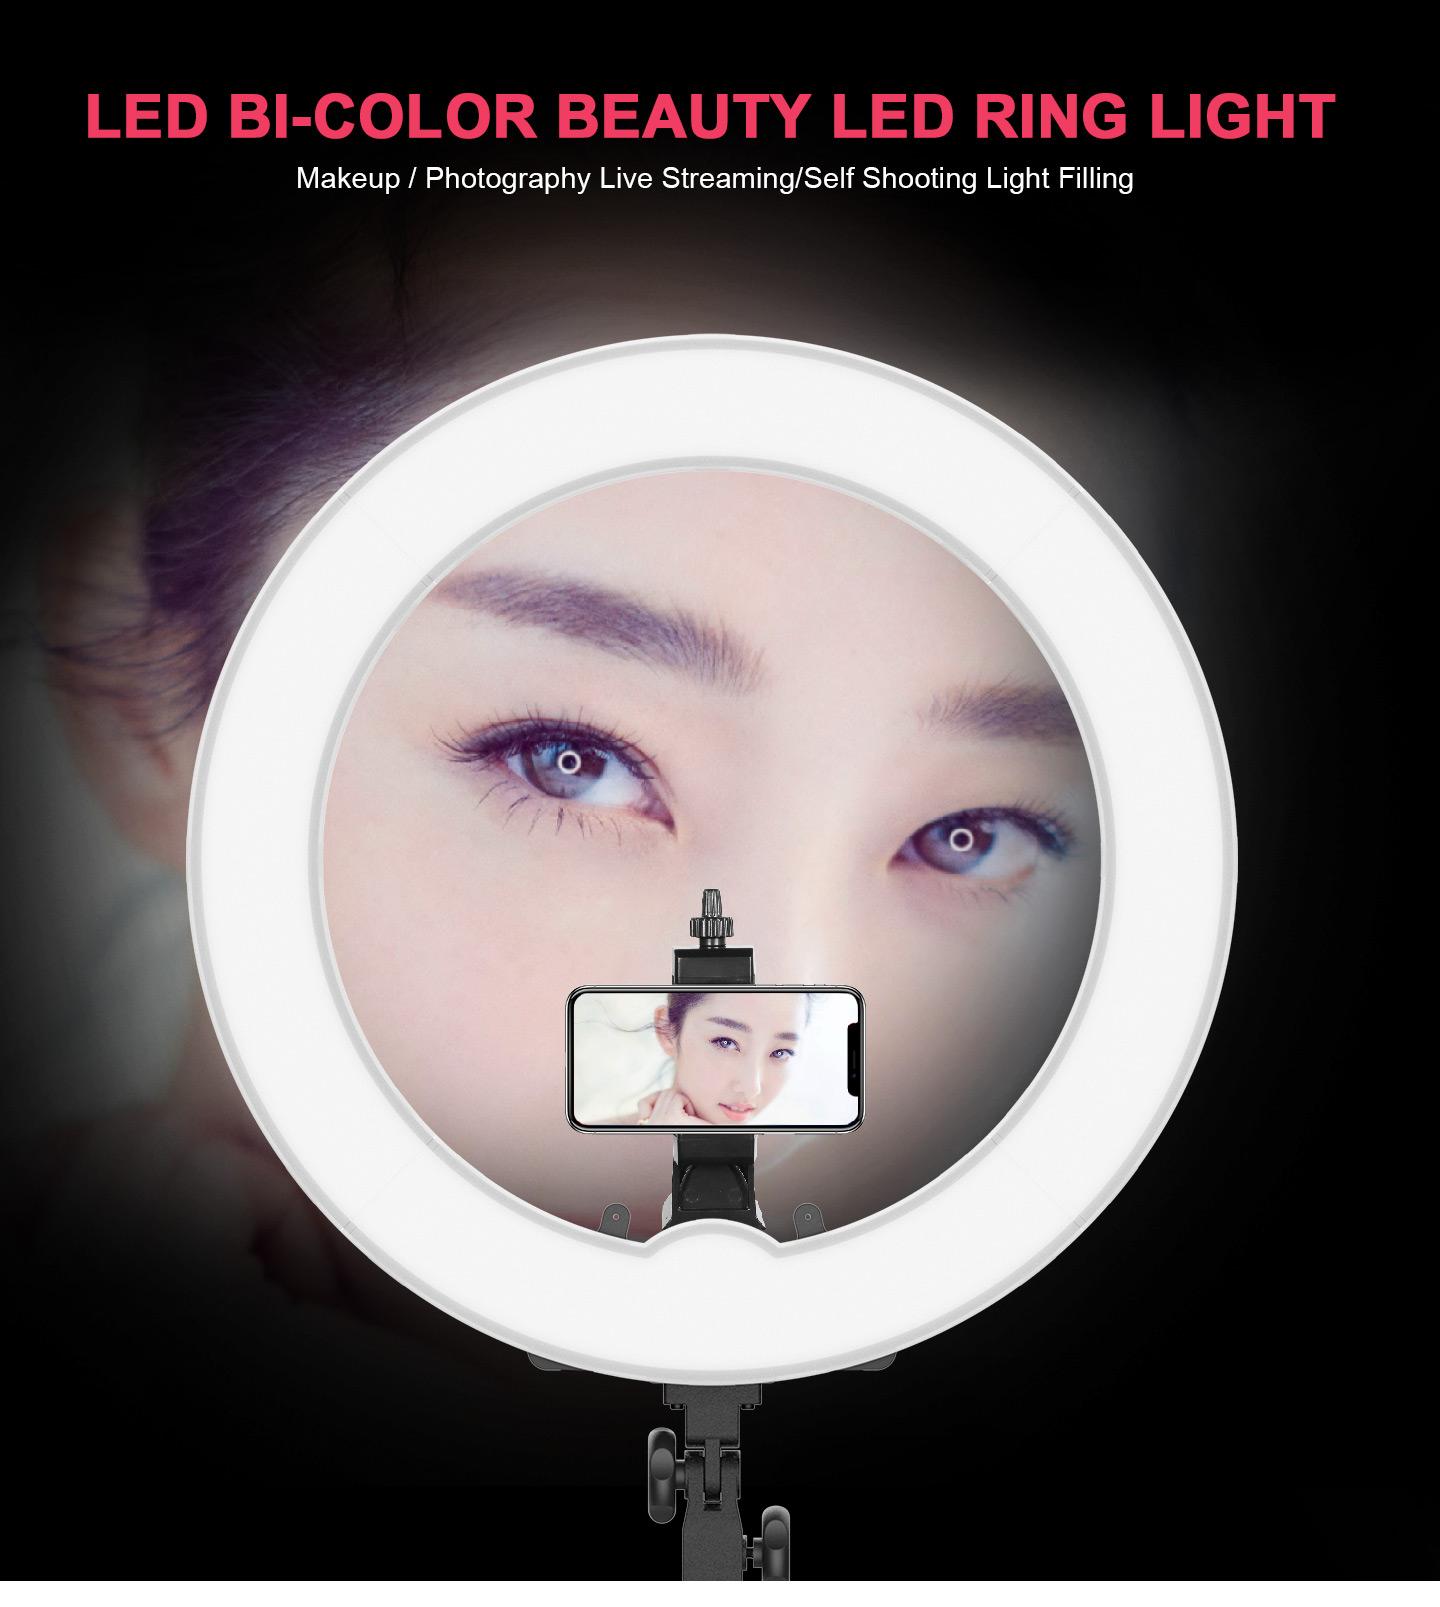 LED BI-COLOR BEAUTY LED RING LIGHT